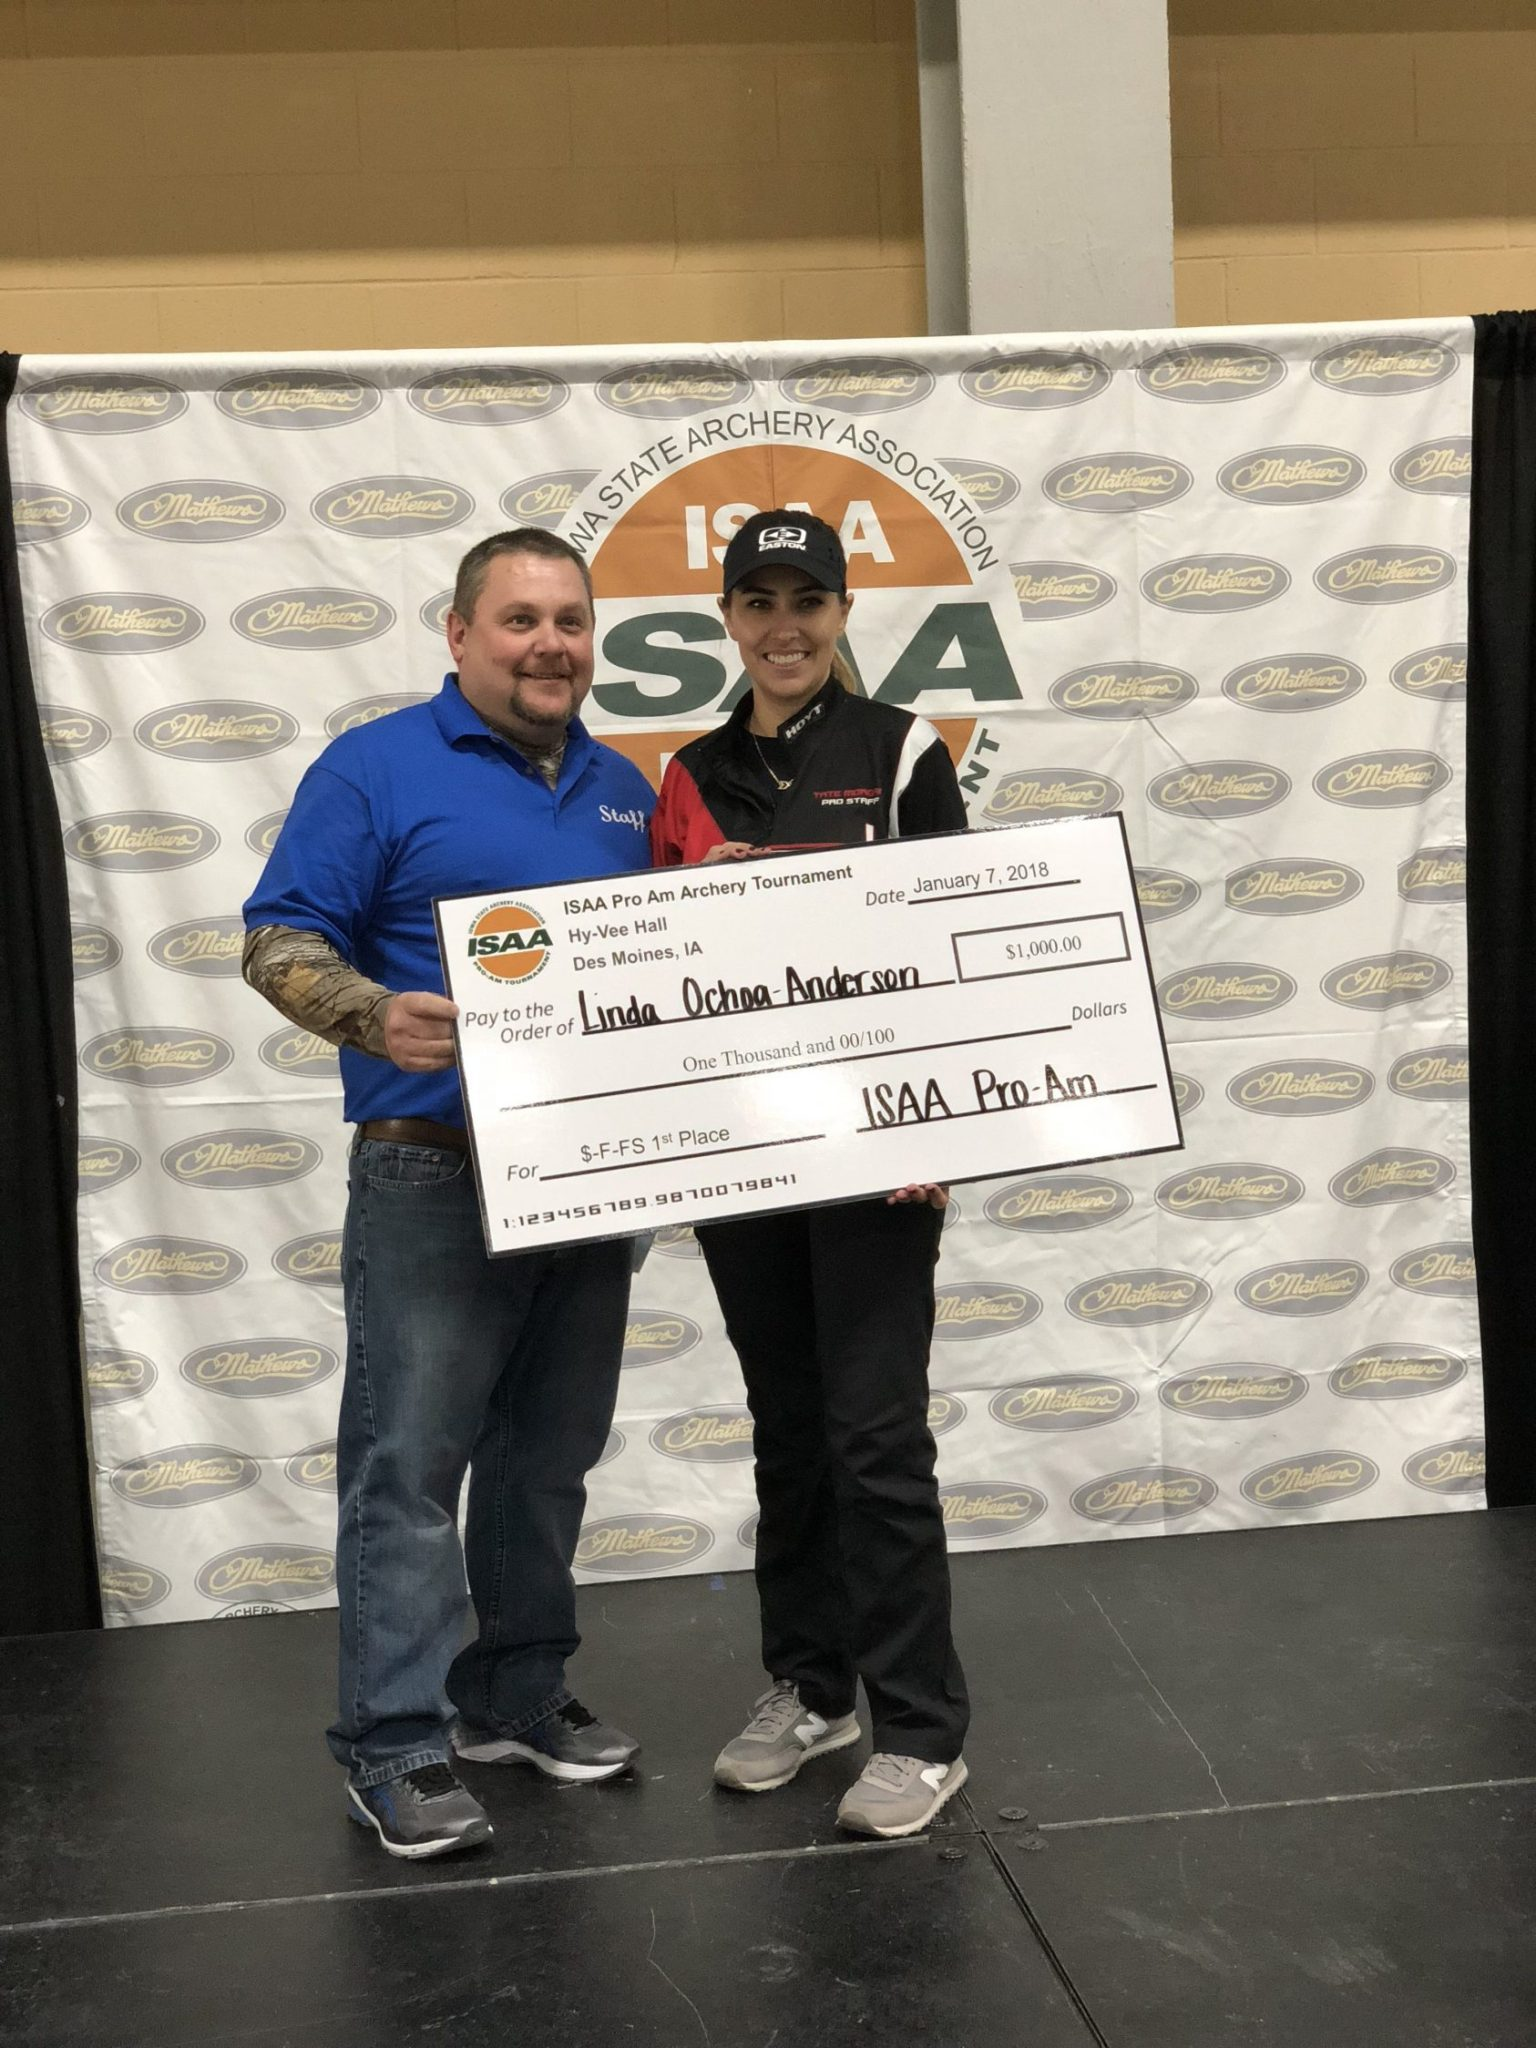 Linda Ochoa-Anderson wins first major indoor of 2018 with X23